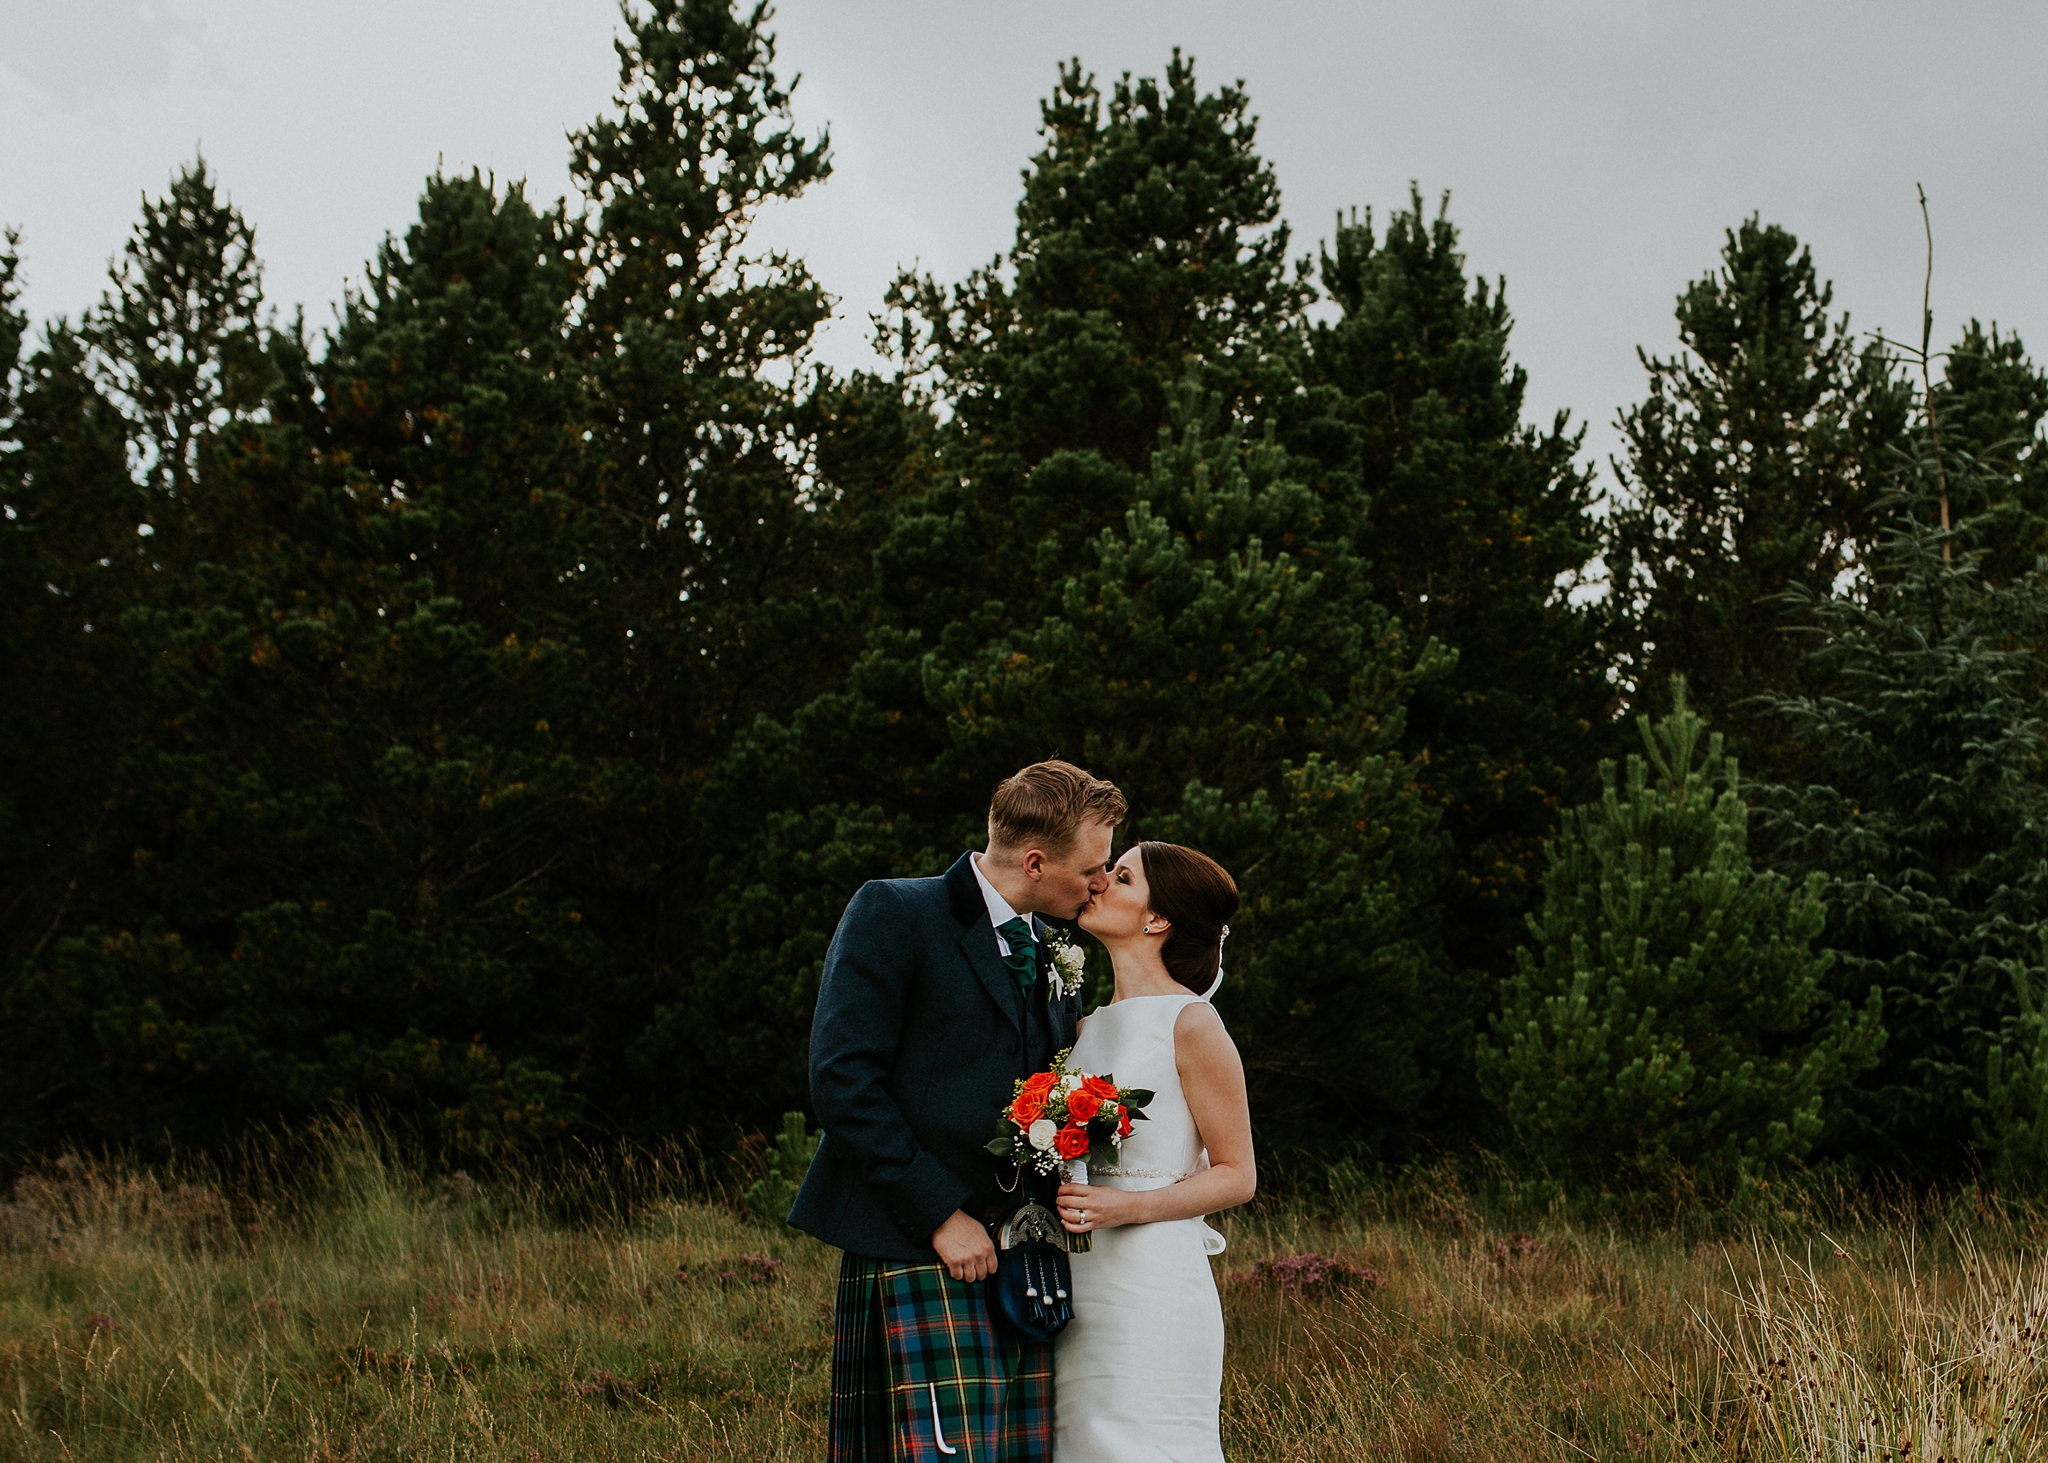 Linda&Shockie_northuist_wedding_photographer-43.JPG